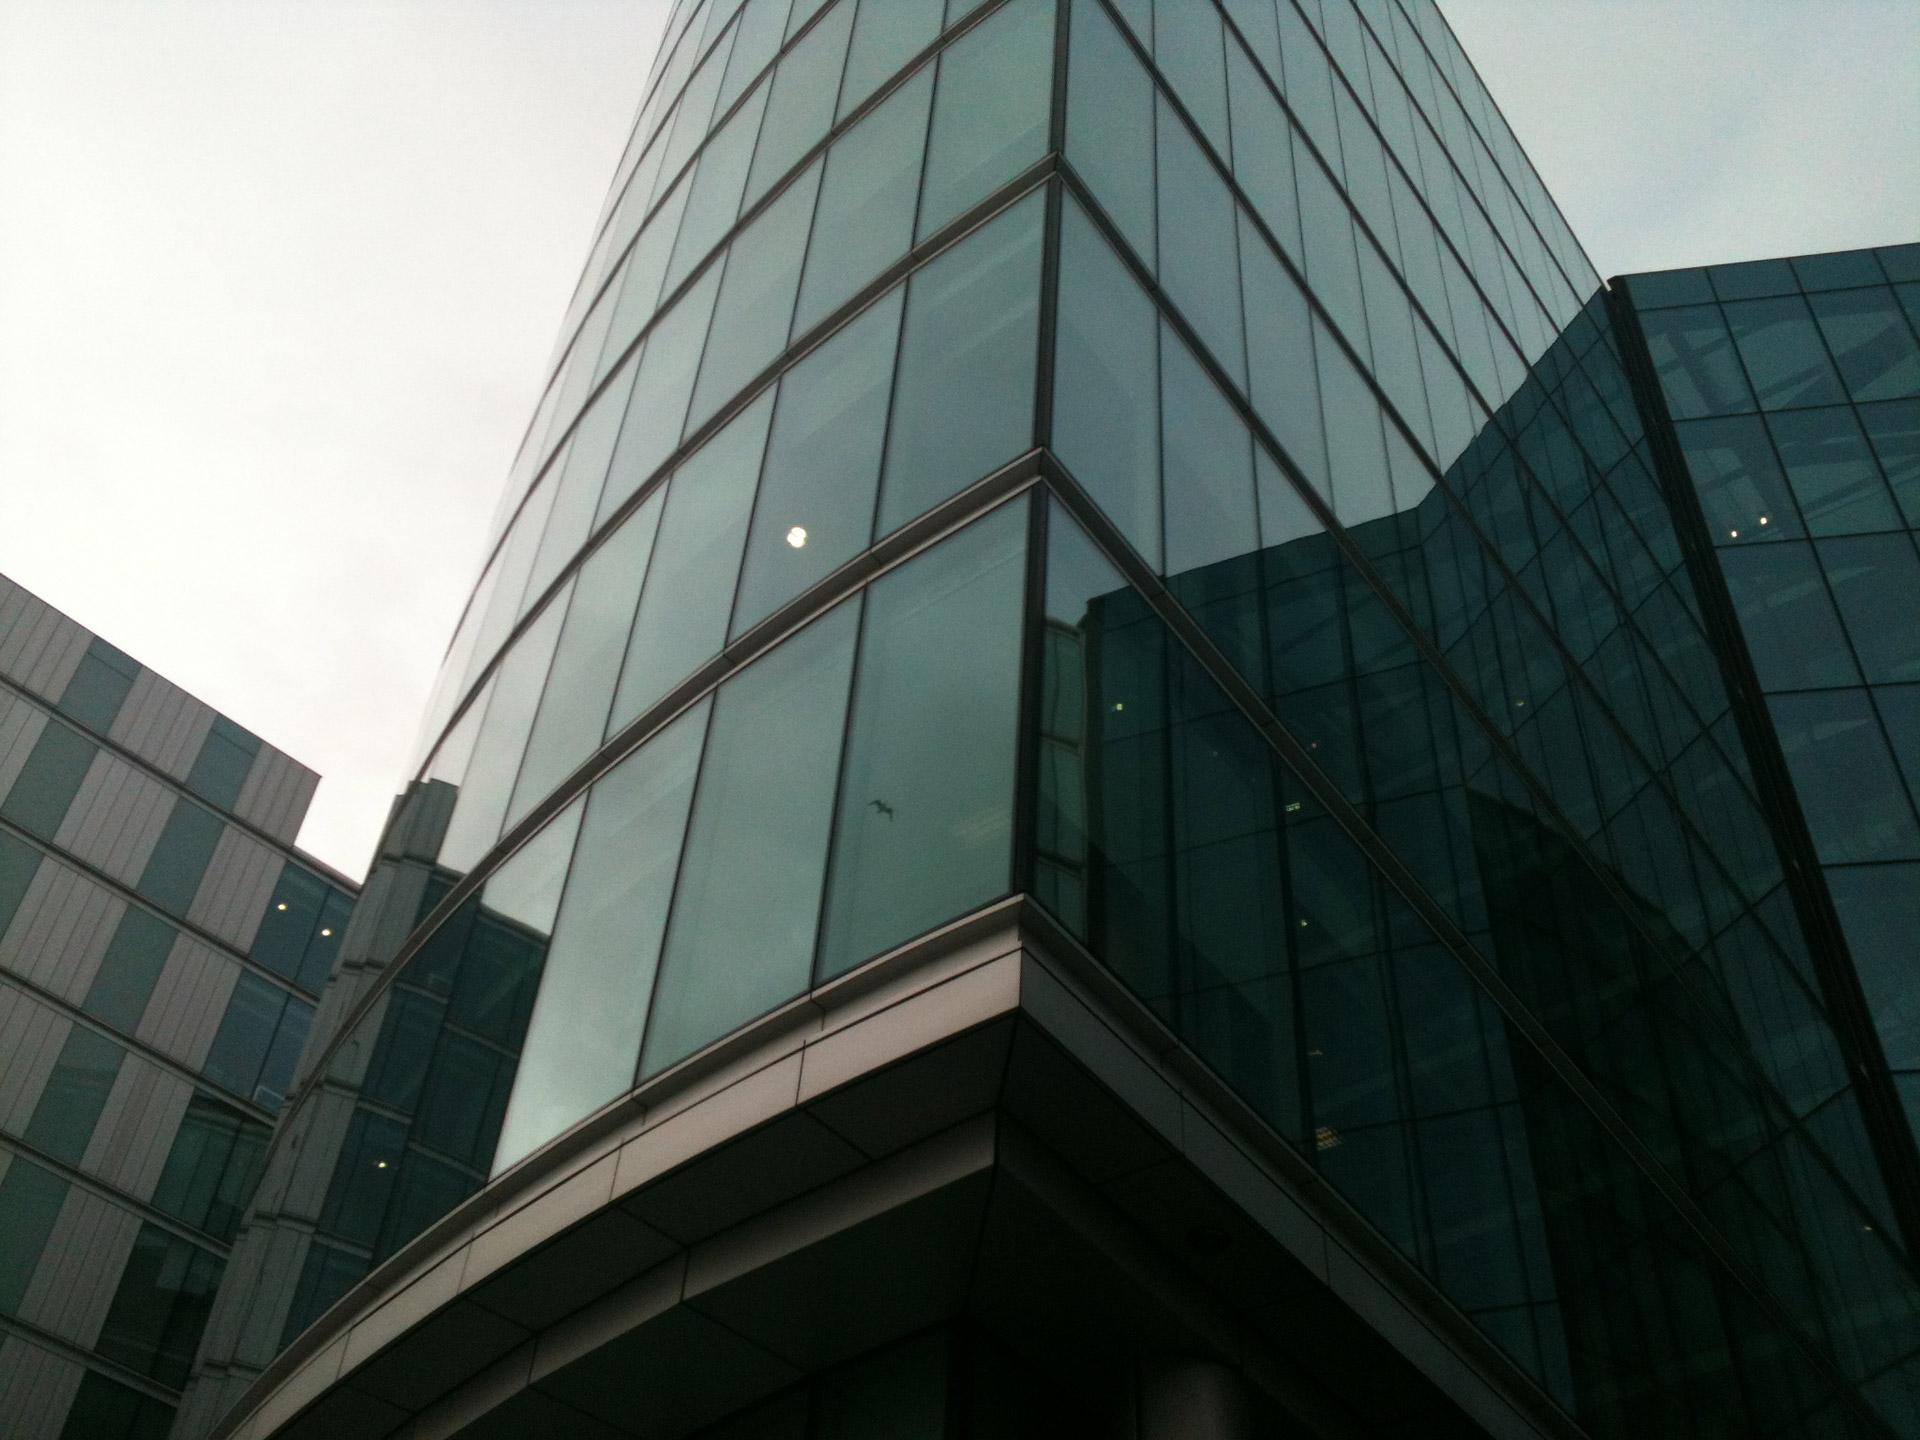 Mirror Glass Building Free Stock Photo  Public Domain